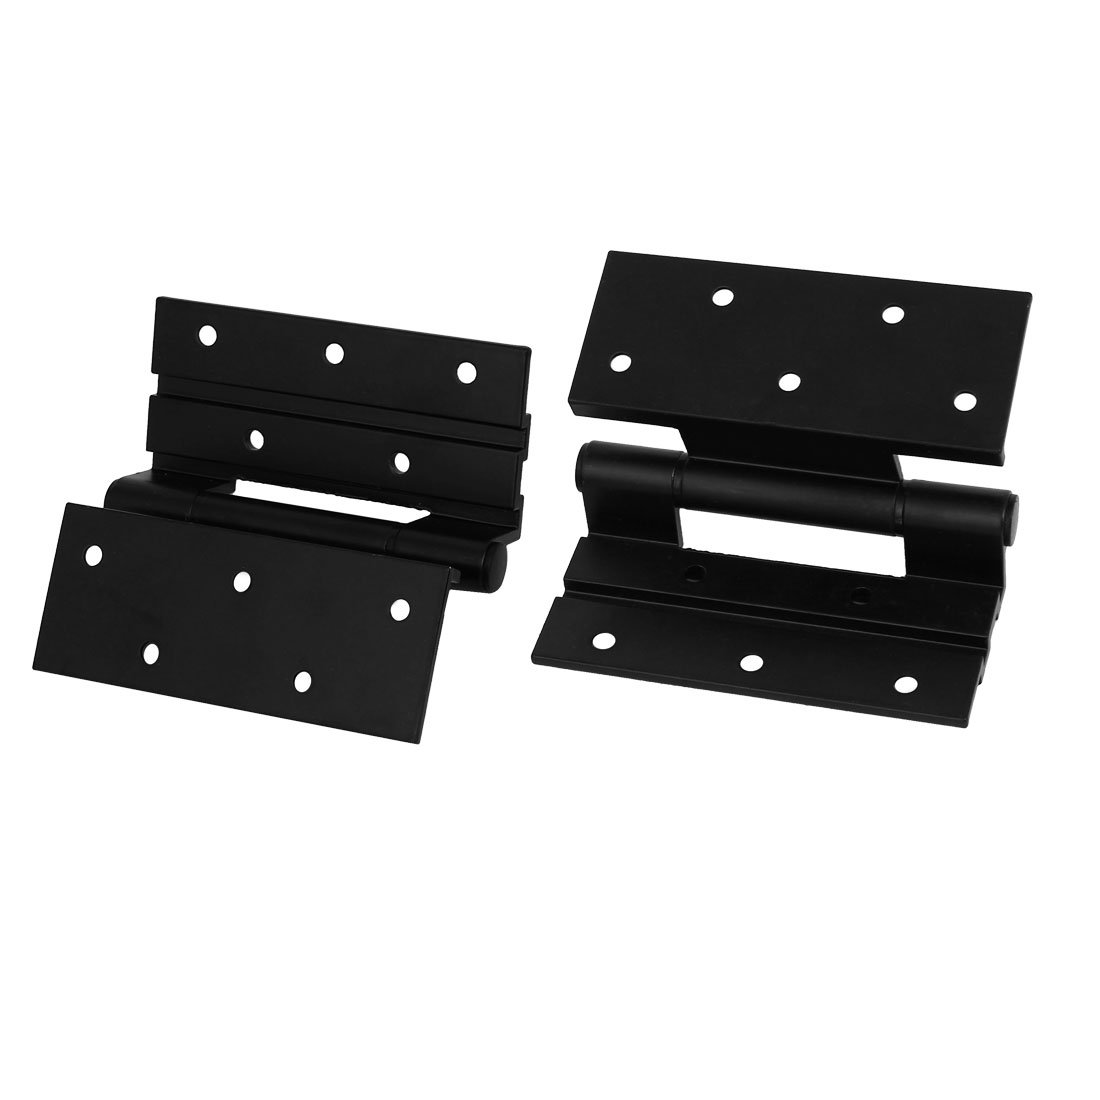 uxcell Window Door 4-inch Long Aluminum Alloy Screw Fixed Stormproof Butt Hinge Black 2pcs